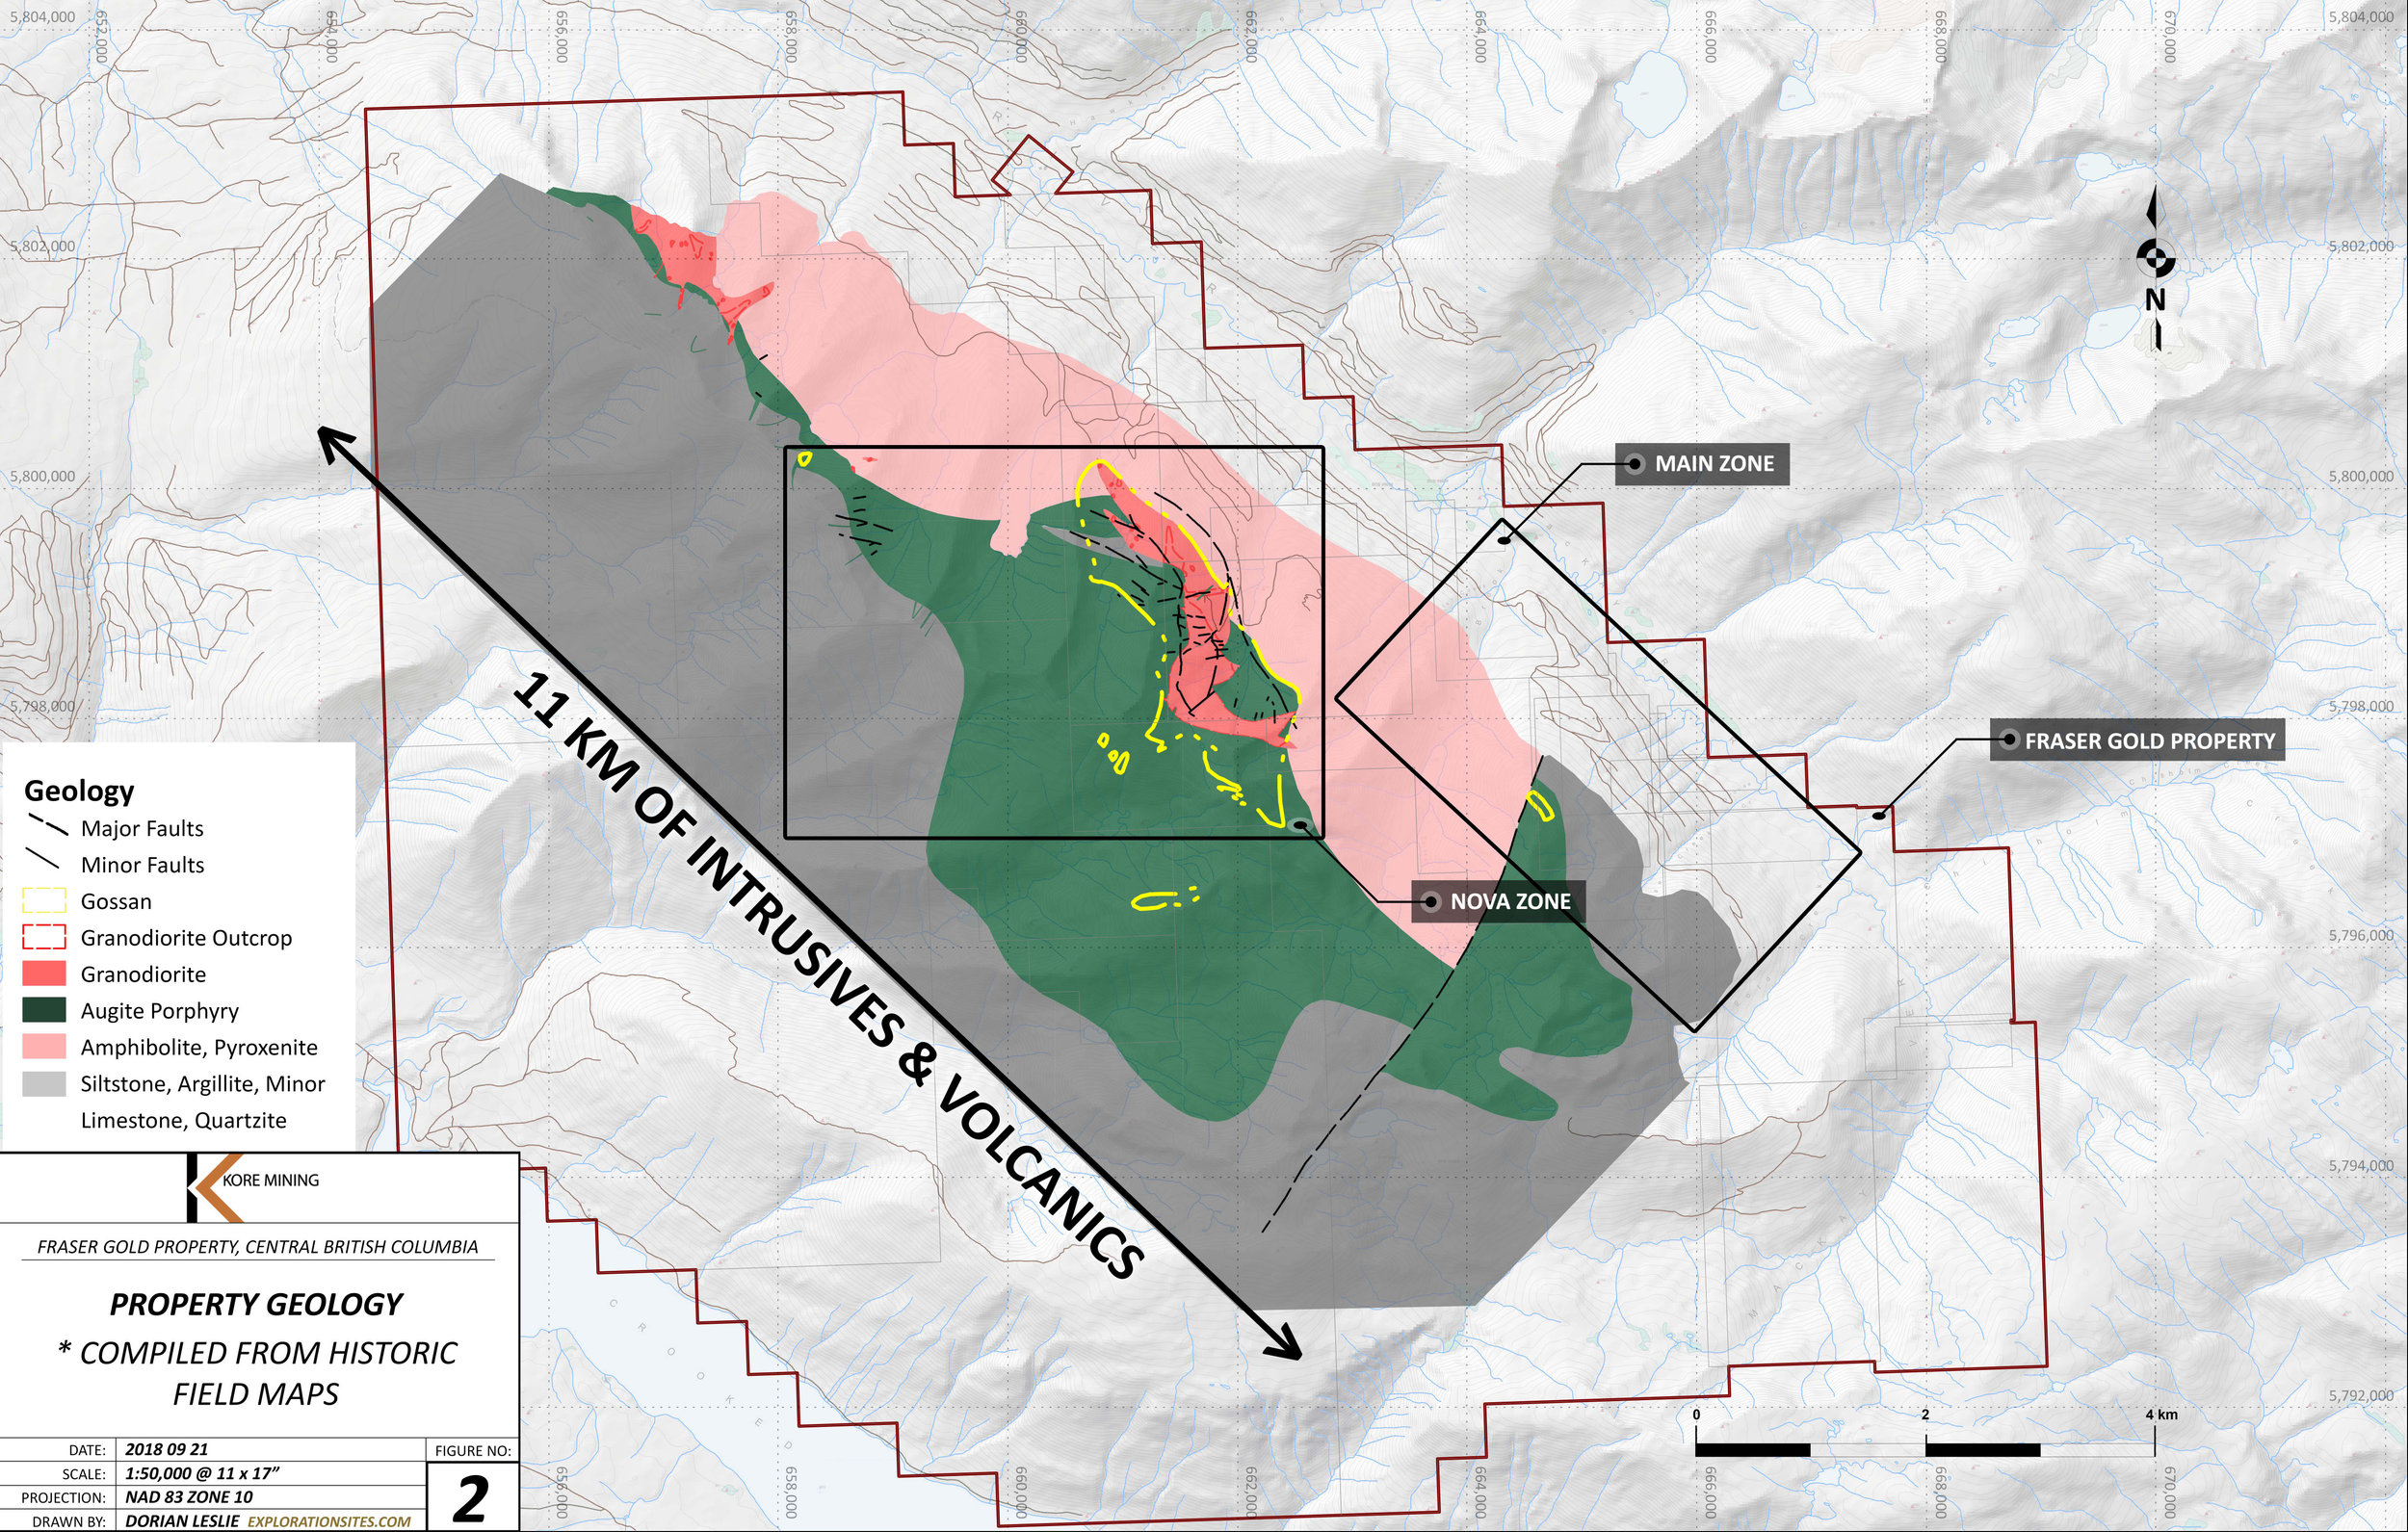 Updated Property Boundary, Geology, Main Zone and Nova Zone